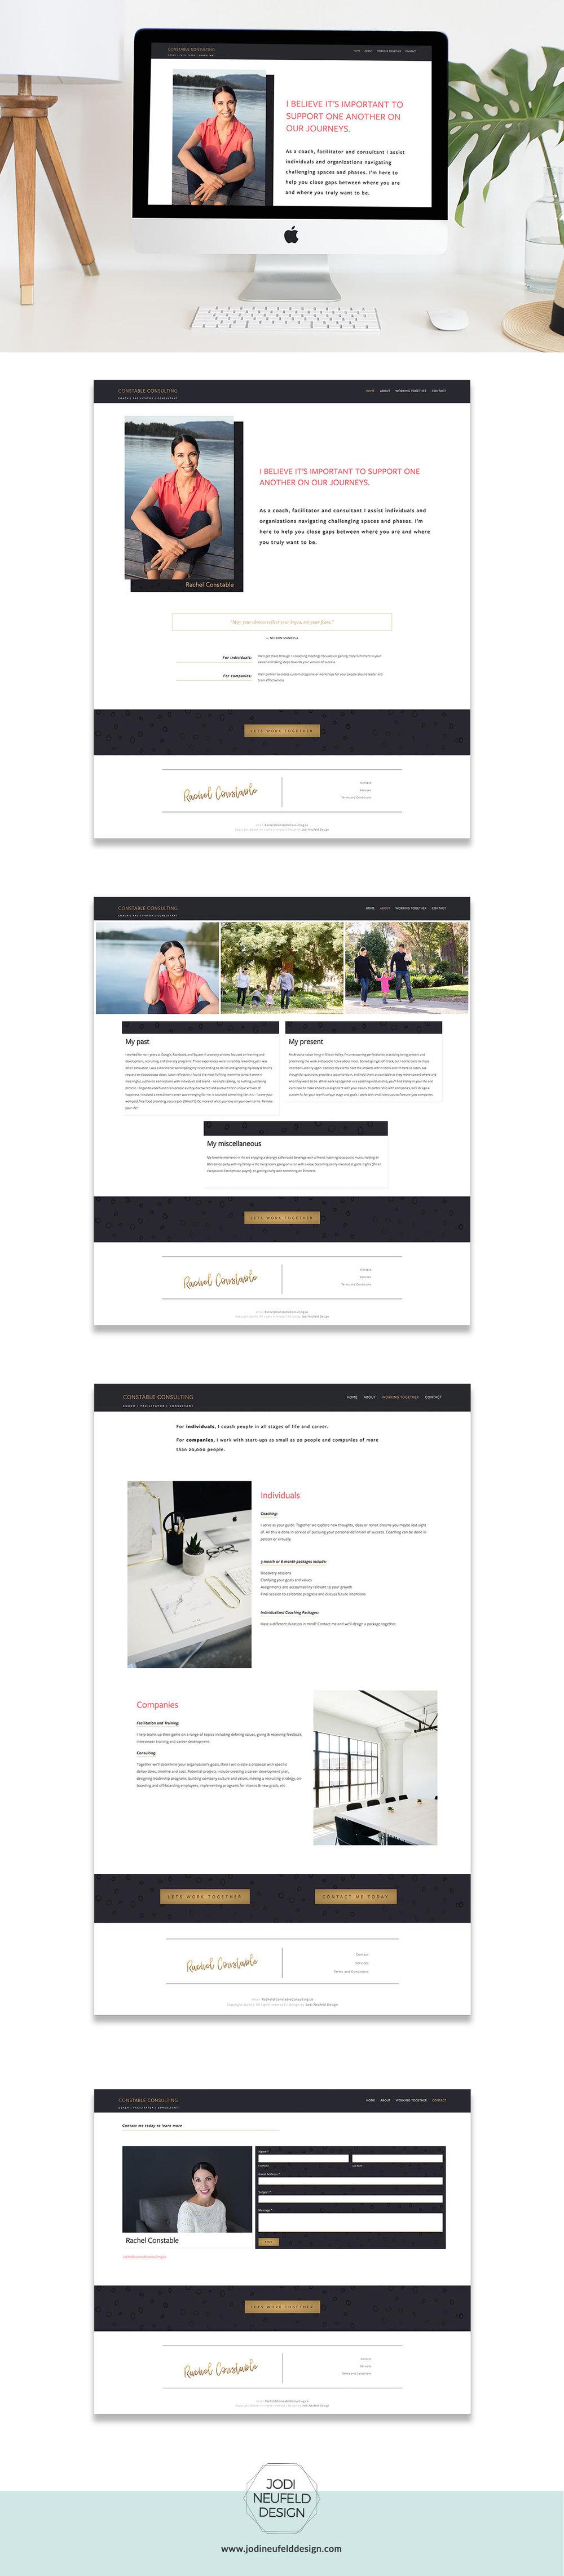 Constable Consulting | Squarespace Web Design by Jodi Neufeld Design